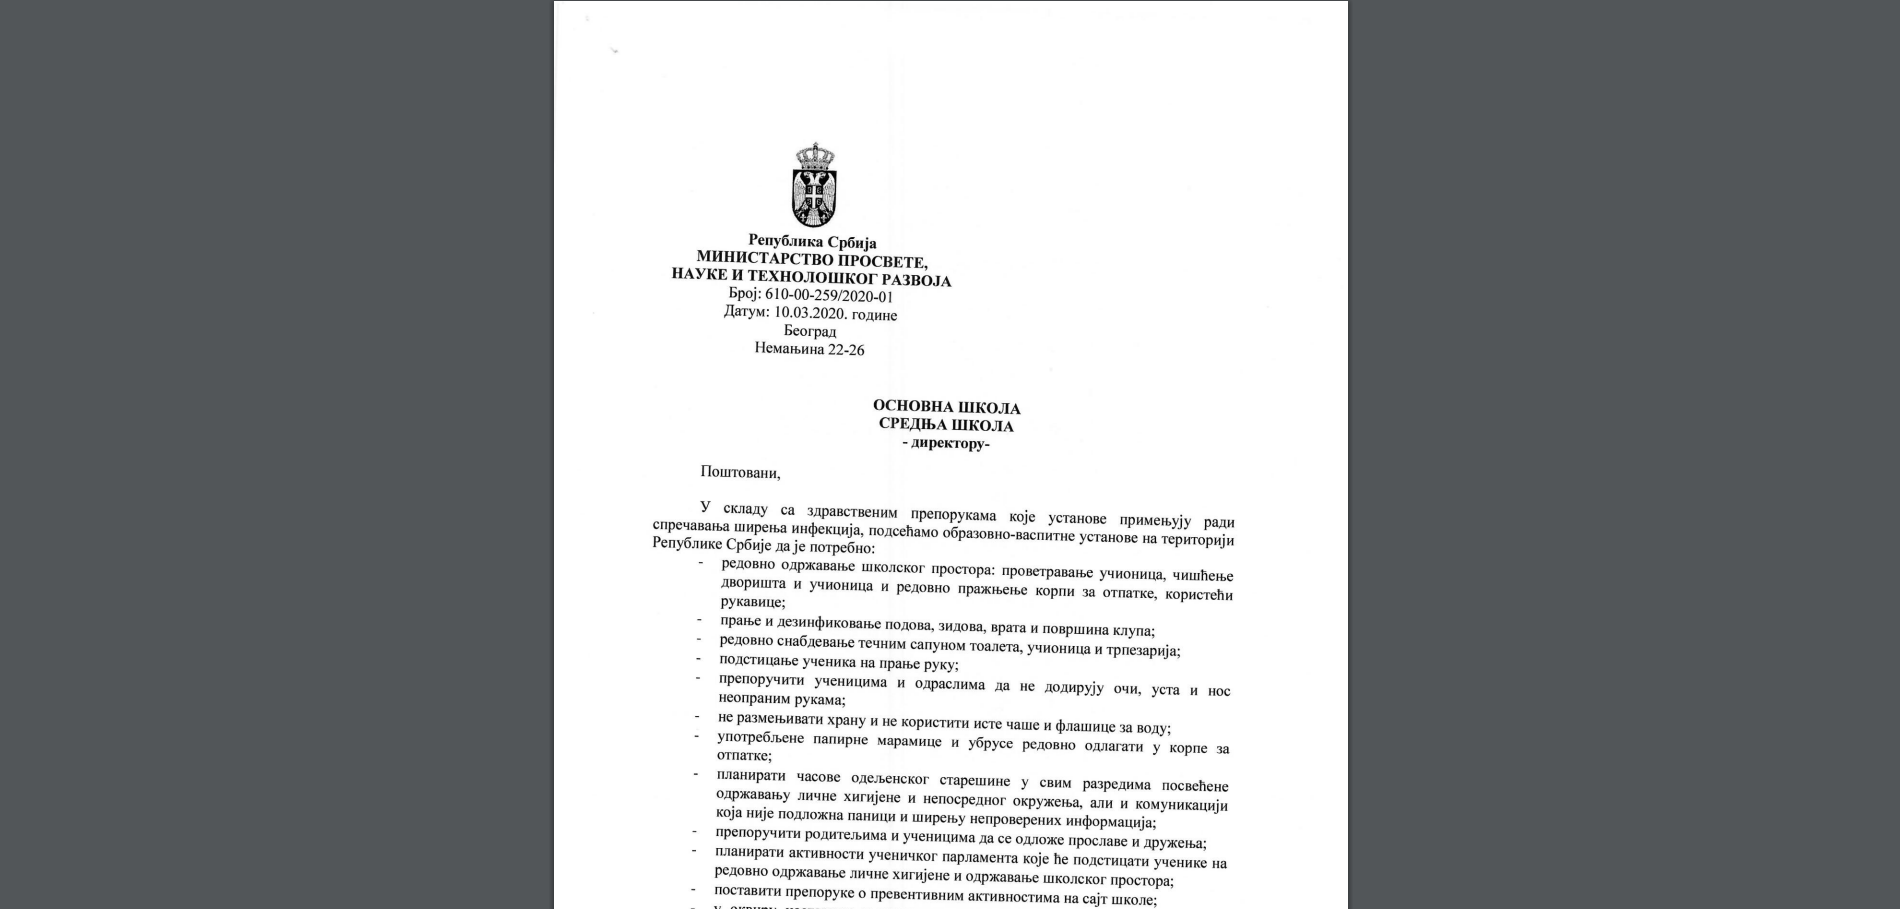 Допис из министарства 10.03.2020